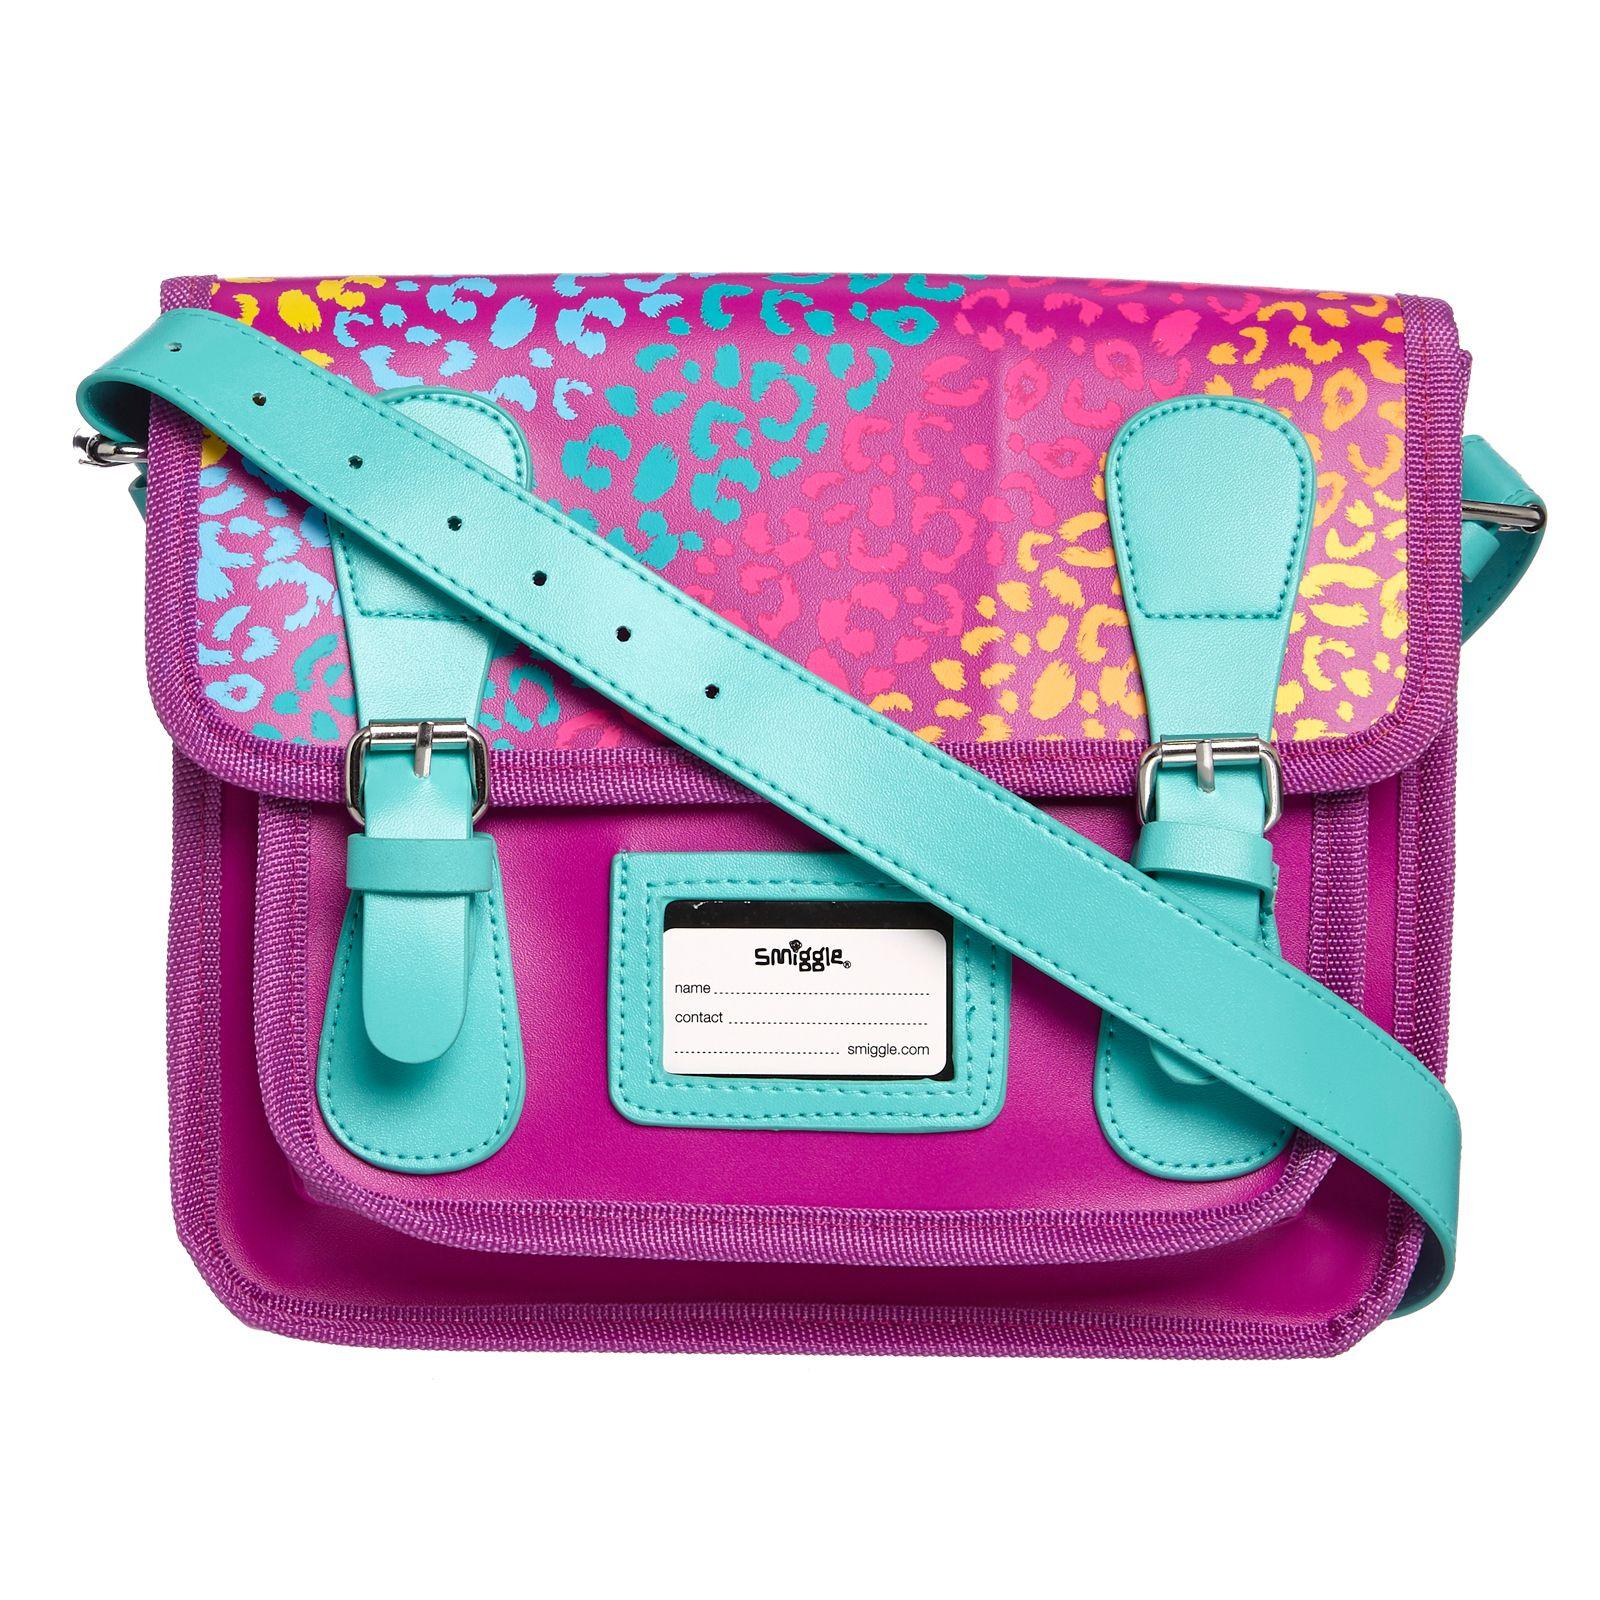 Smiggle bags for school - Bag